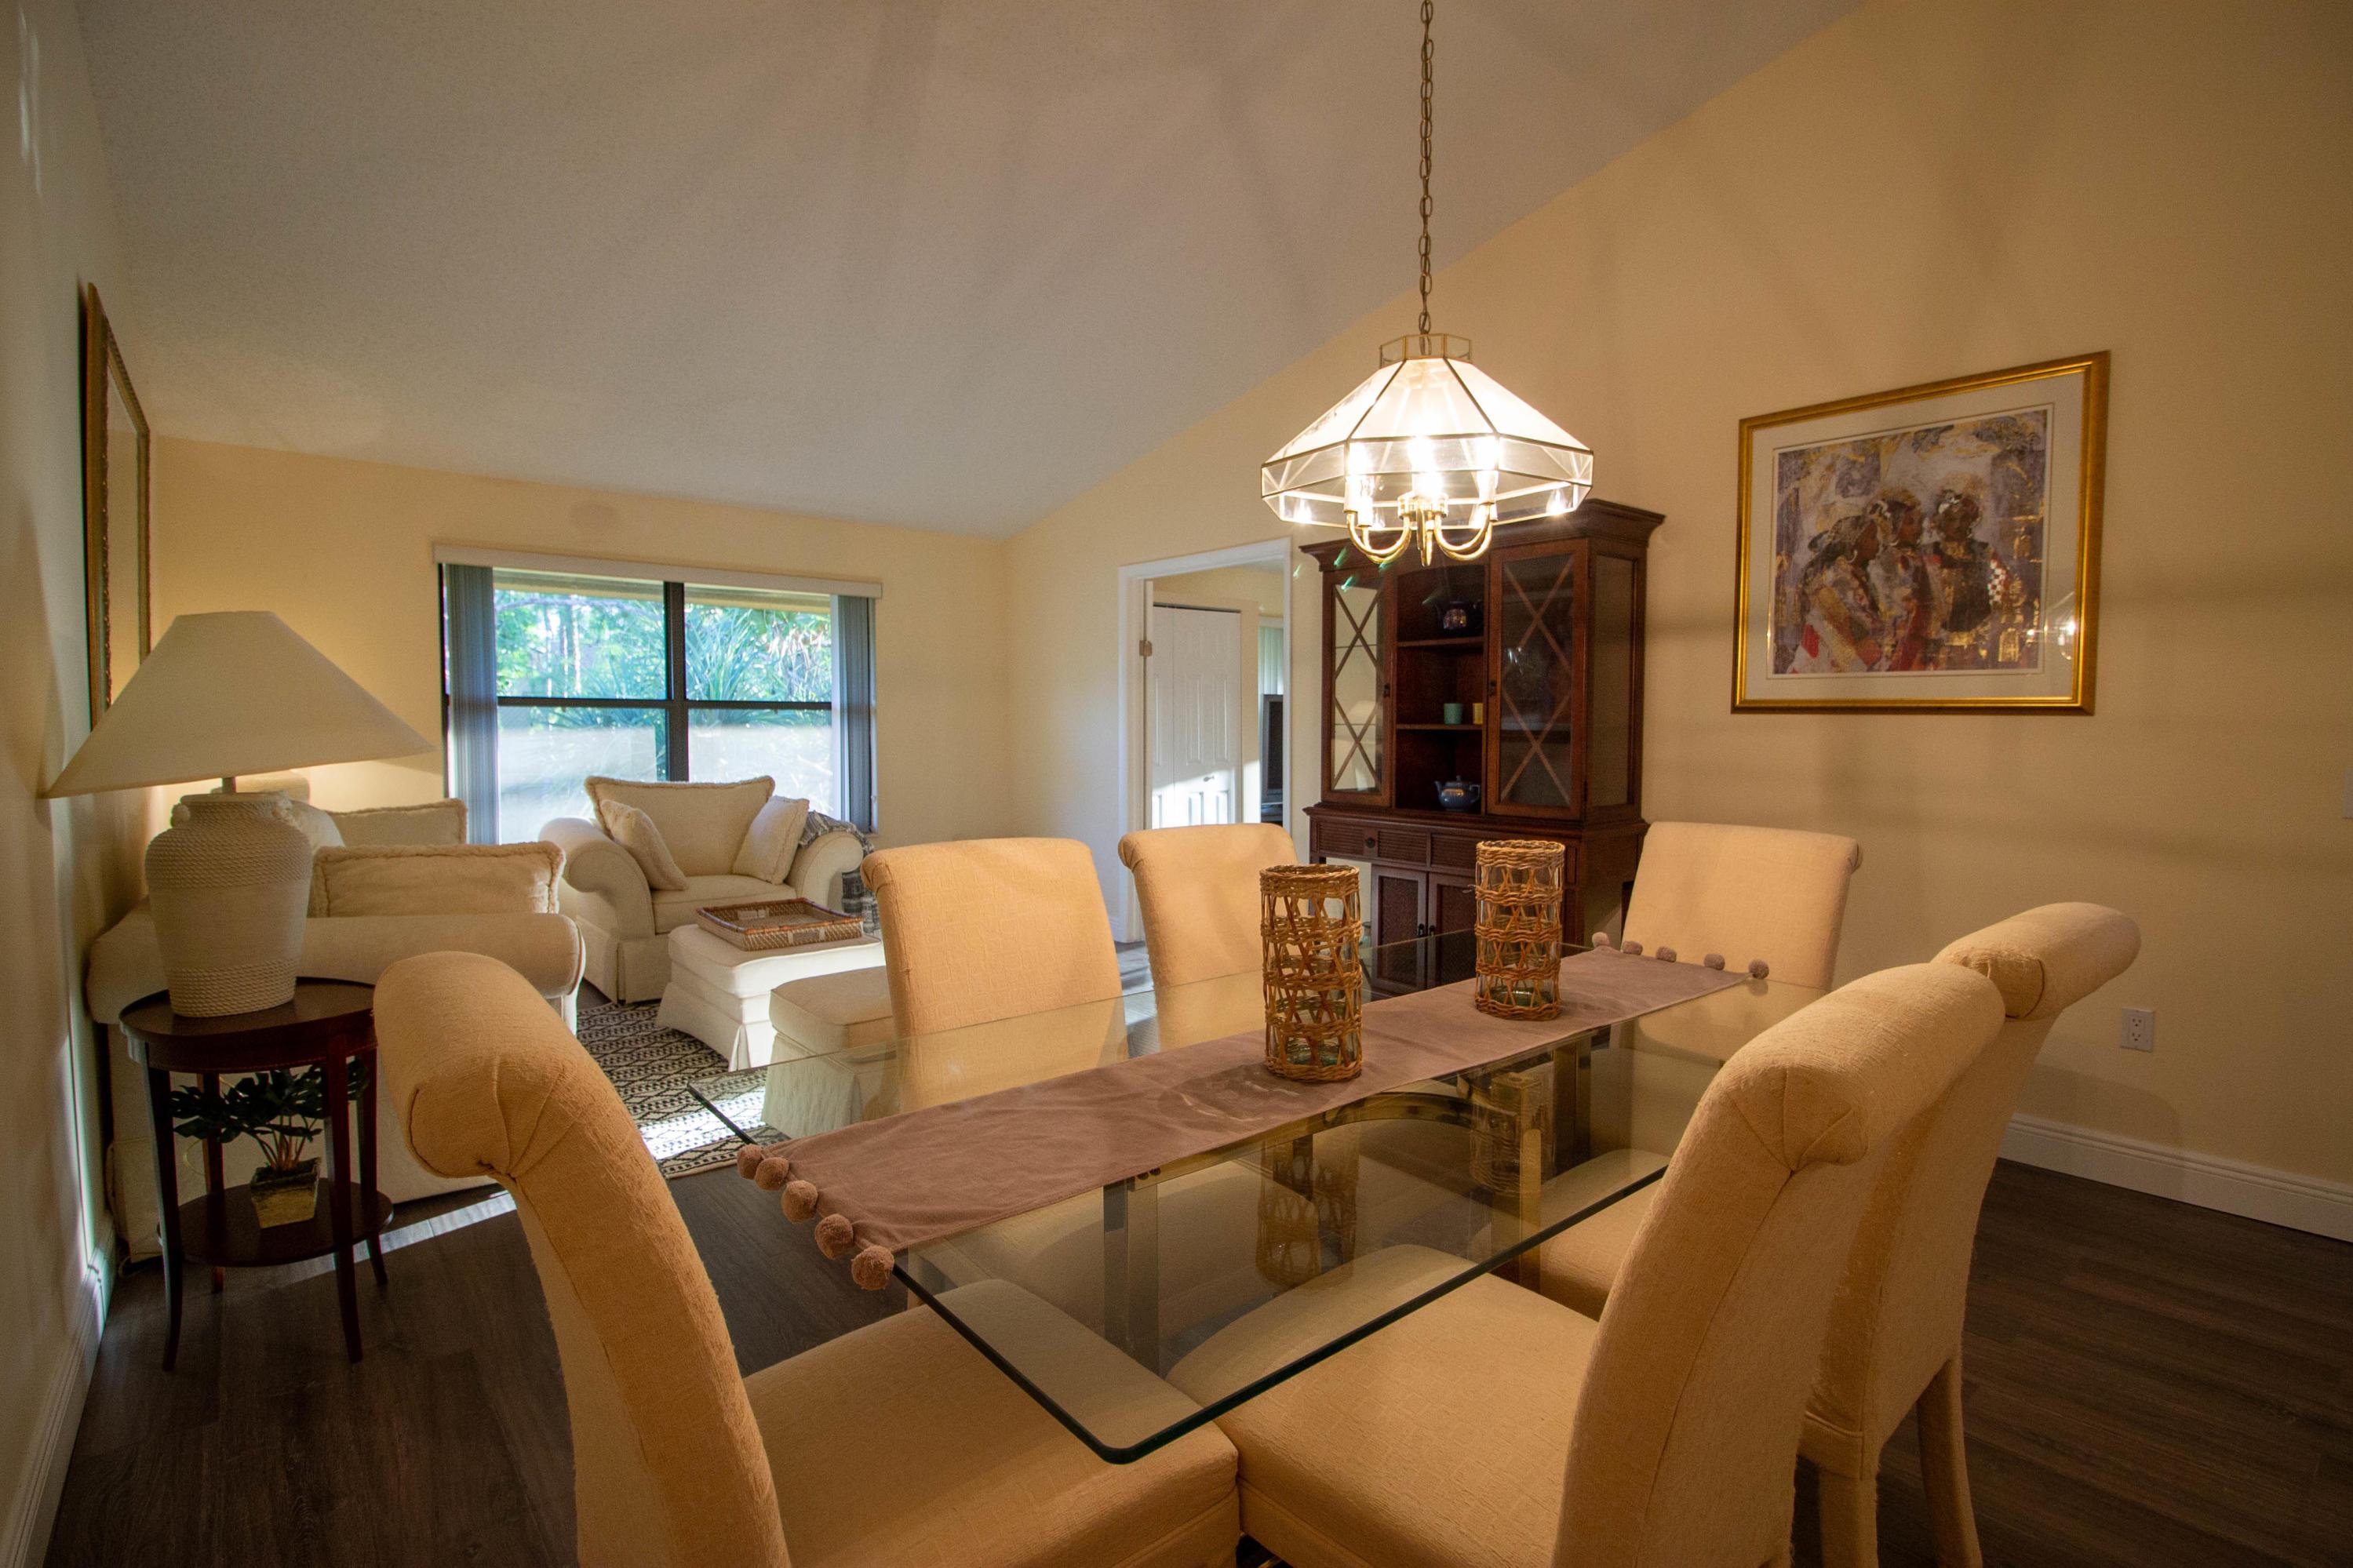 13035 Albright Court, Wellington, Florida 33414, 3 Bedrooms Bedrooms, ,2 BathroomsBathrooms,Condo/Coop,For Rent,Albright,2,RX-10533125